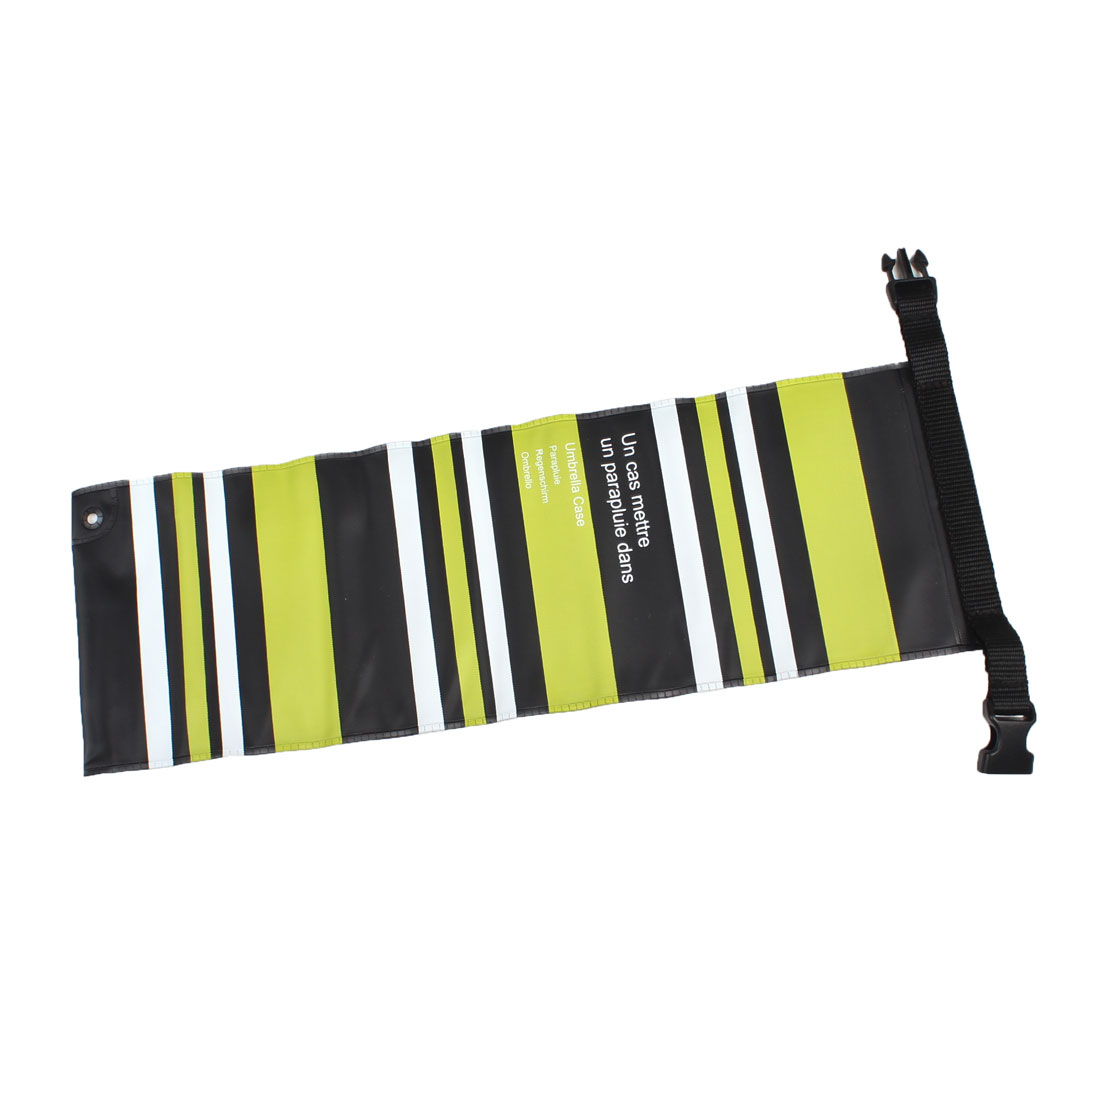 Yellowgreen Water Resistant Auto Car Foldable Umbrella Holder Bag Case